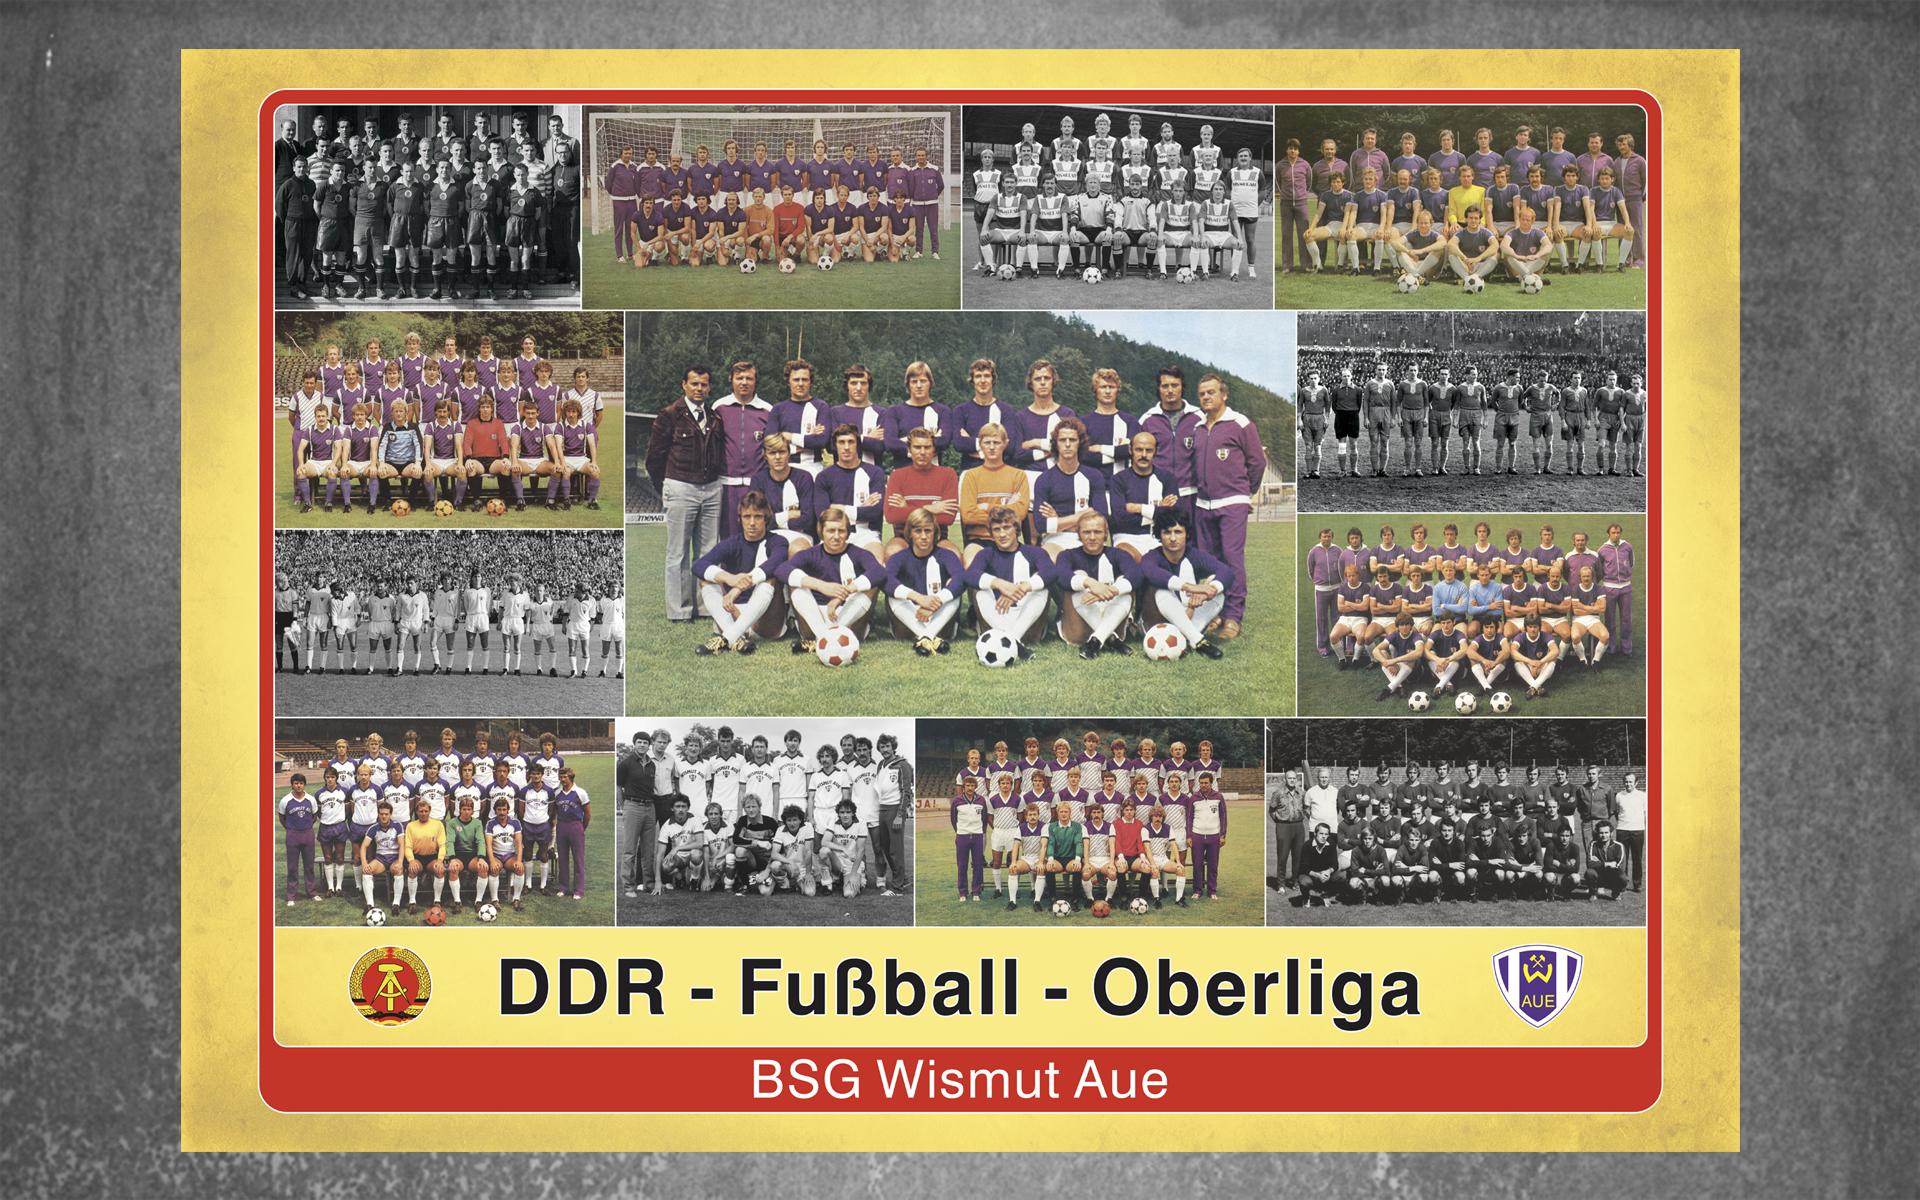 Oberliga Ddr